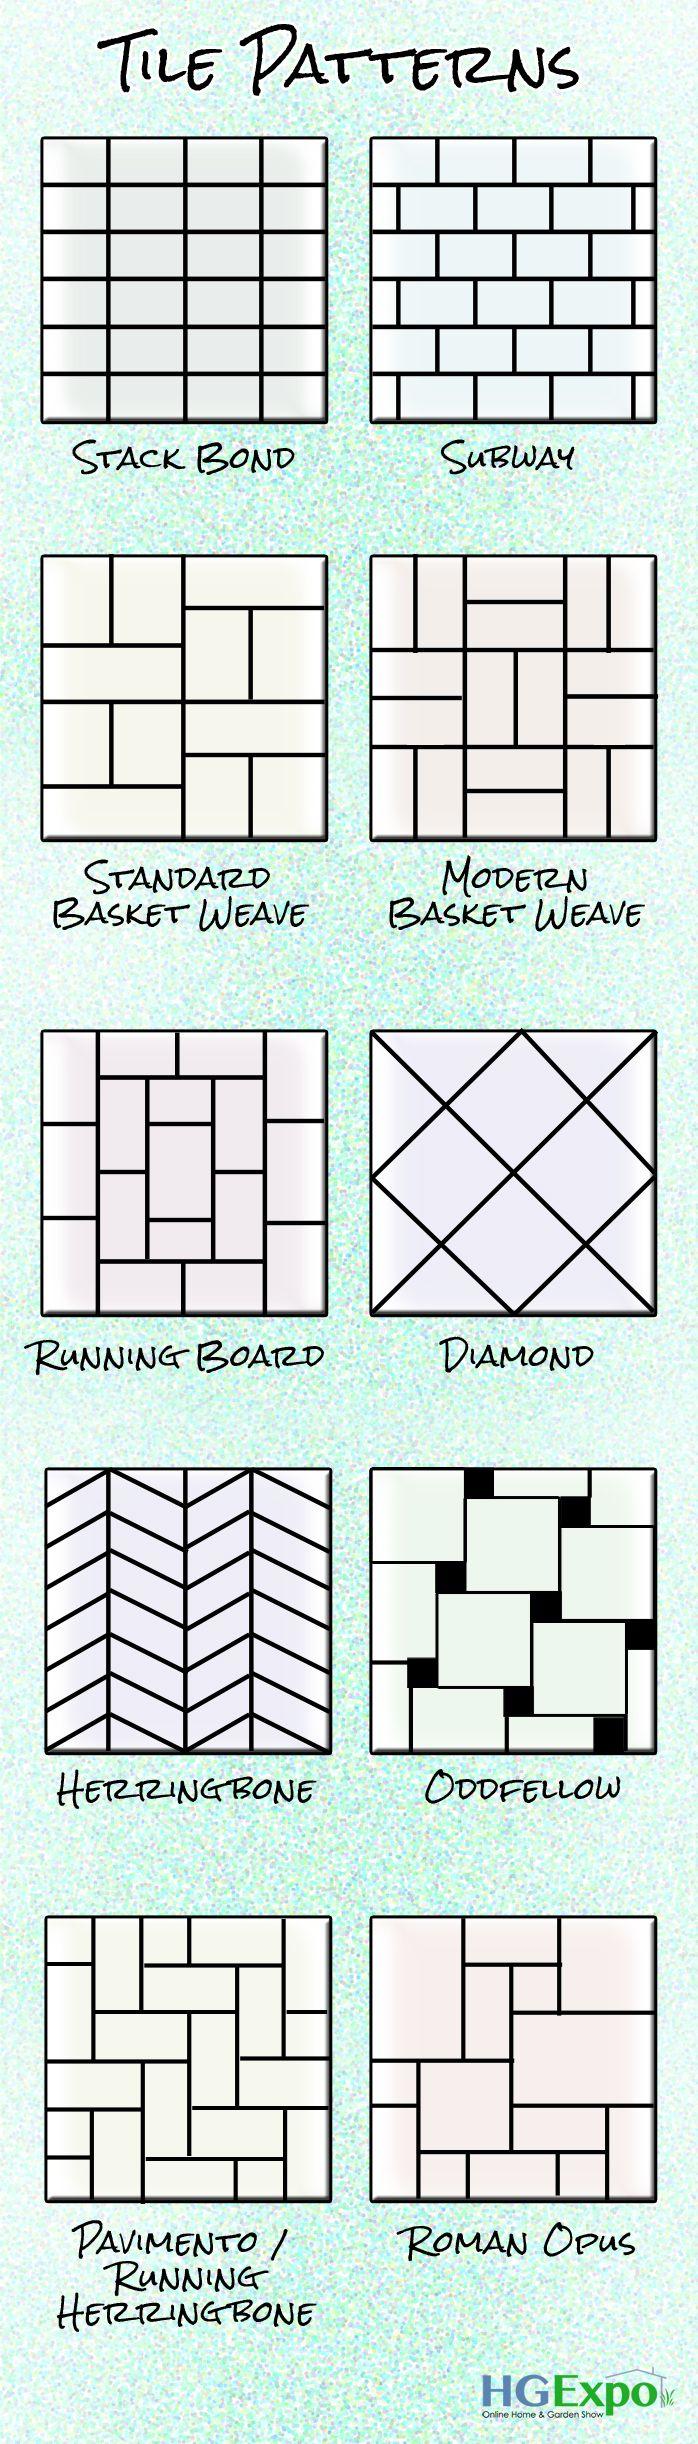 Standard basket weave, running board, oddfellow, roman opus | FLOORS ...